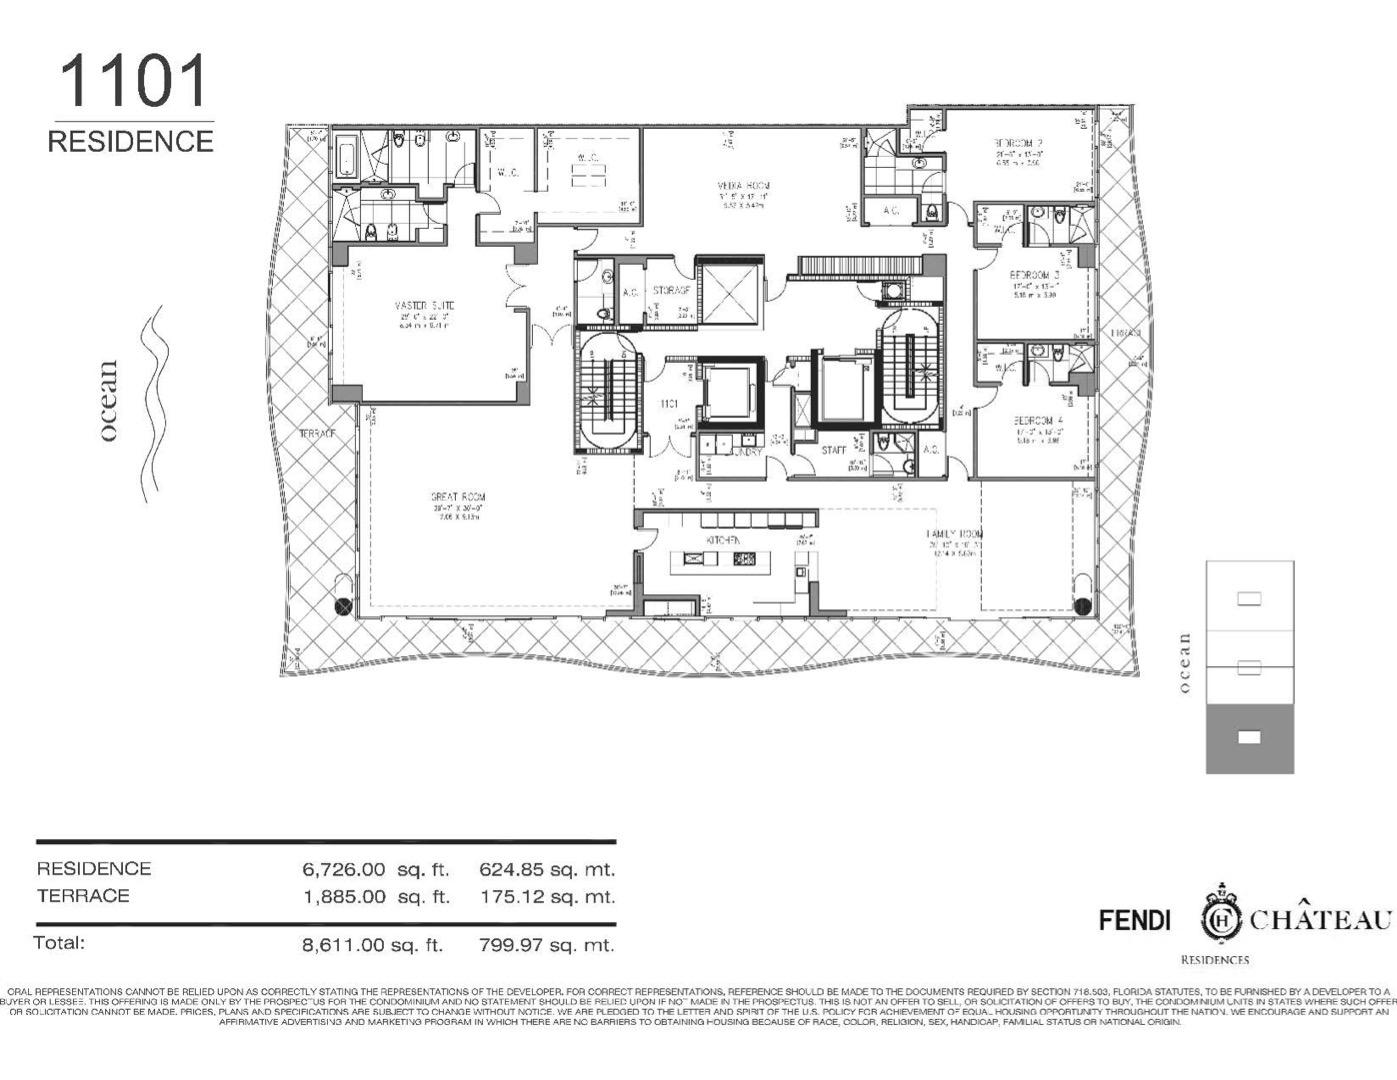 Floor plan image 1101 - 4/4.5/MEDIA ROOM  - 8611 sqft image